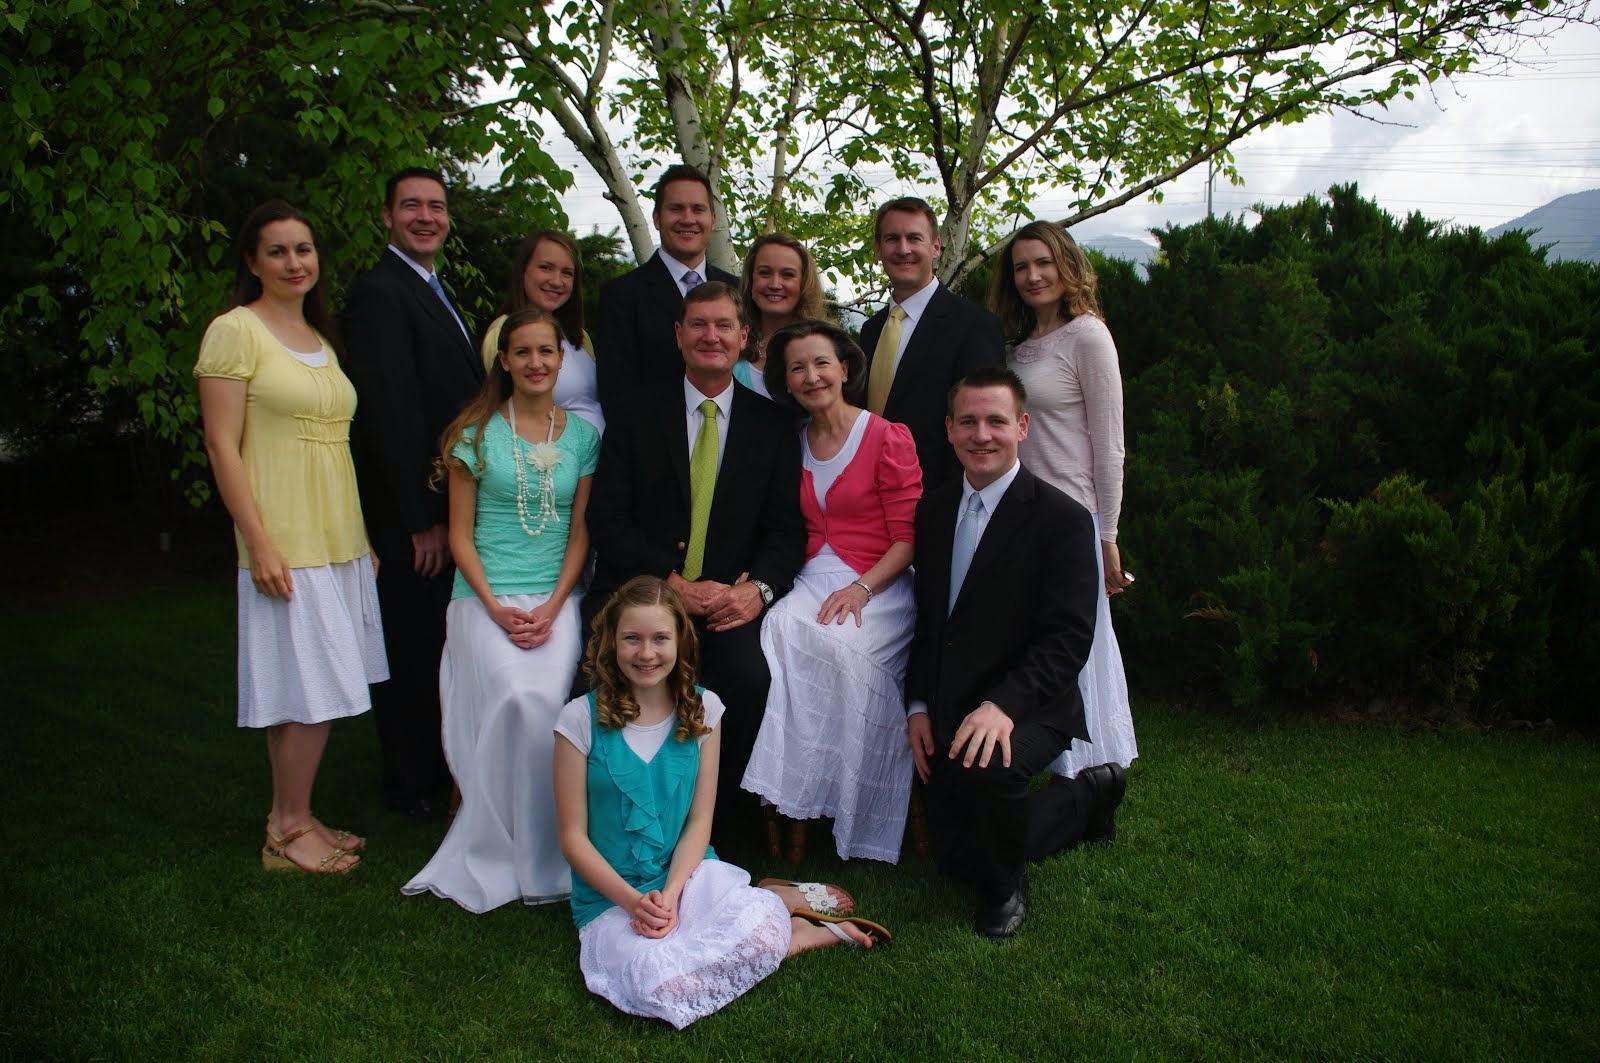 My Family 2014